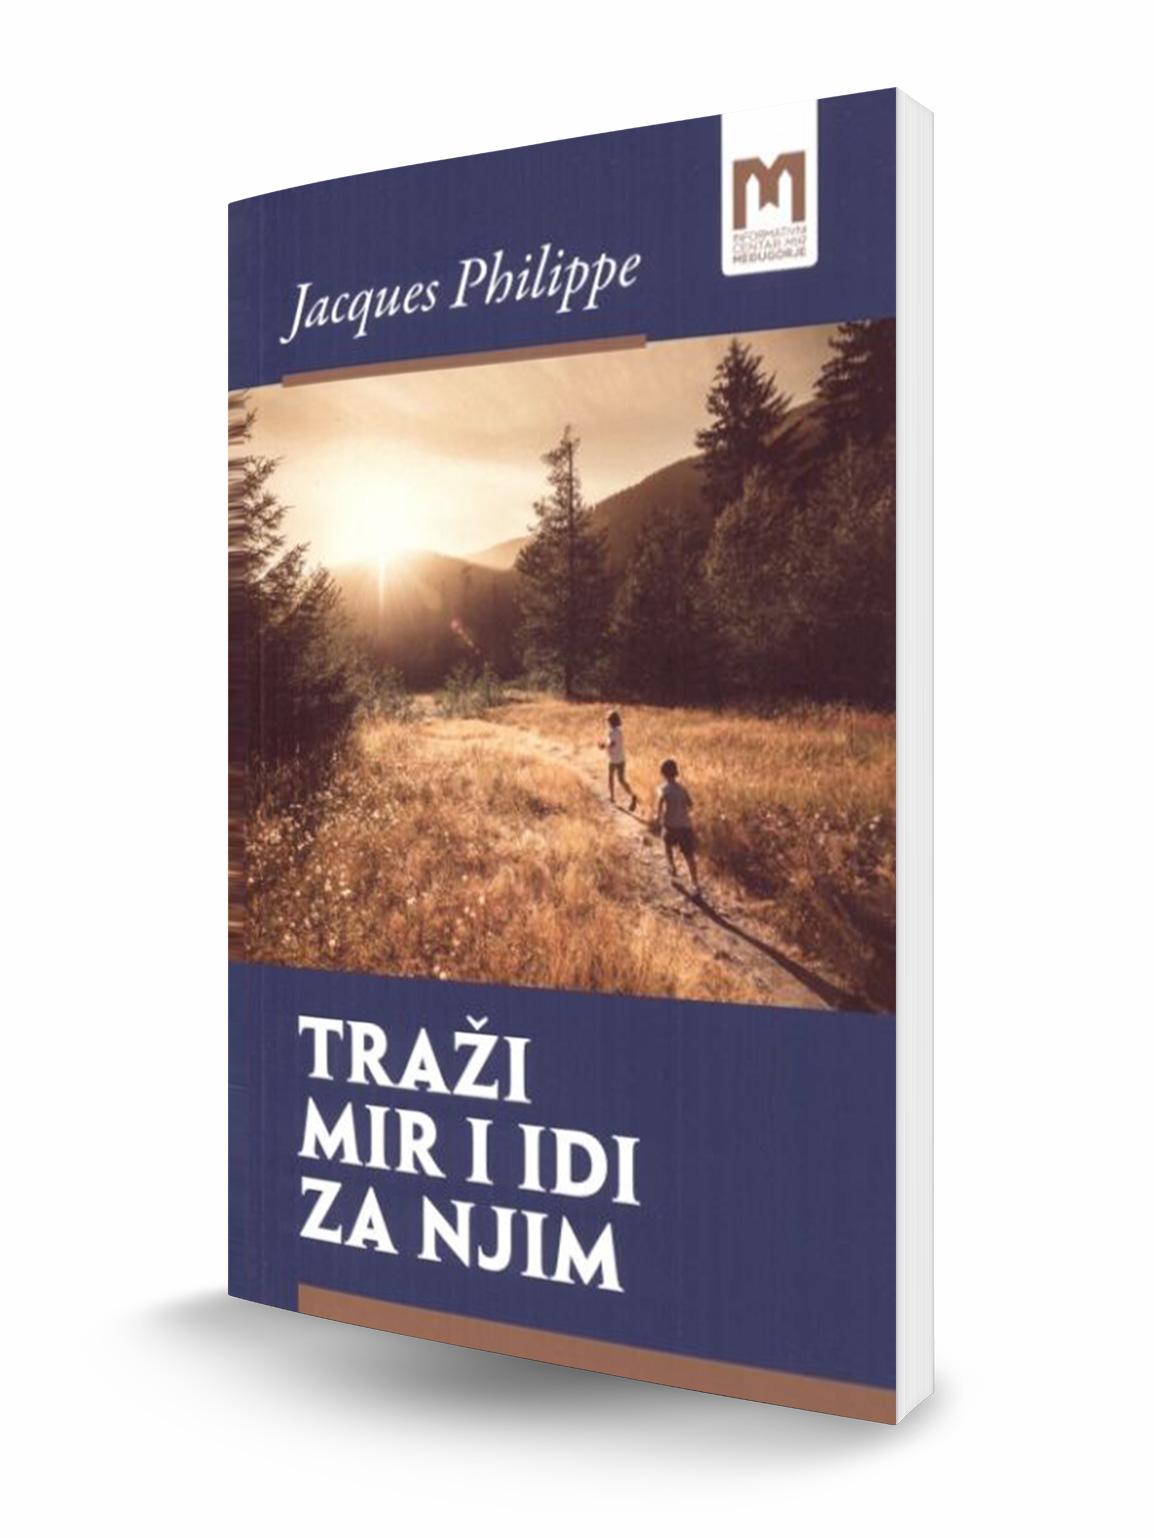 TRAŽI MIR I IDI ZA NJIM - Jacques Philippe